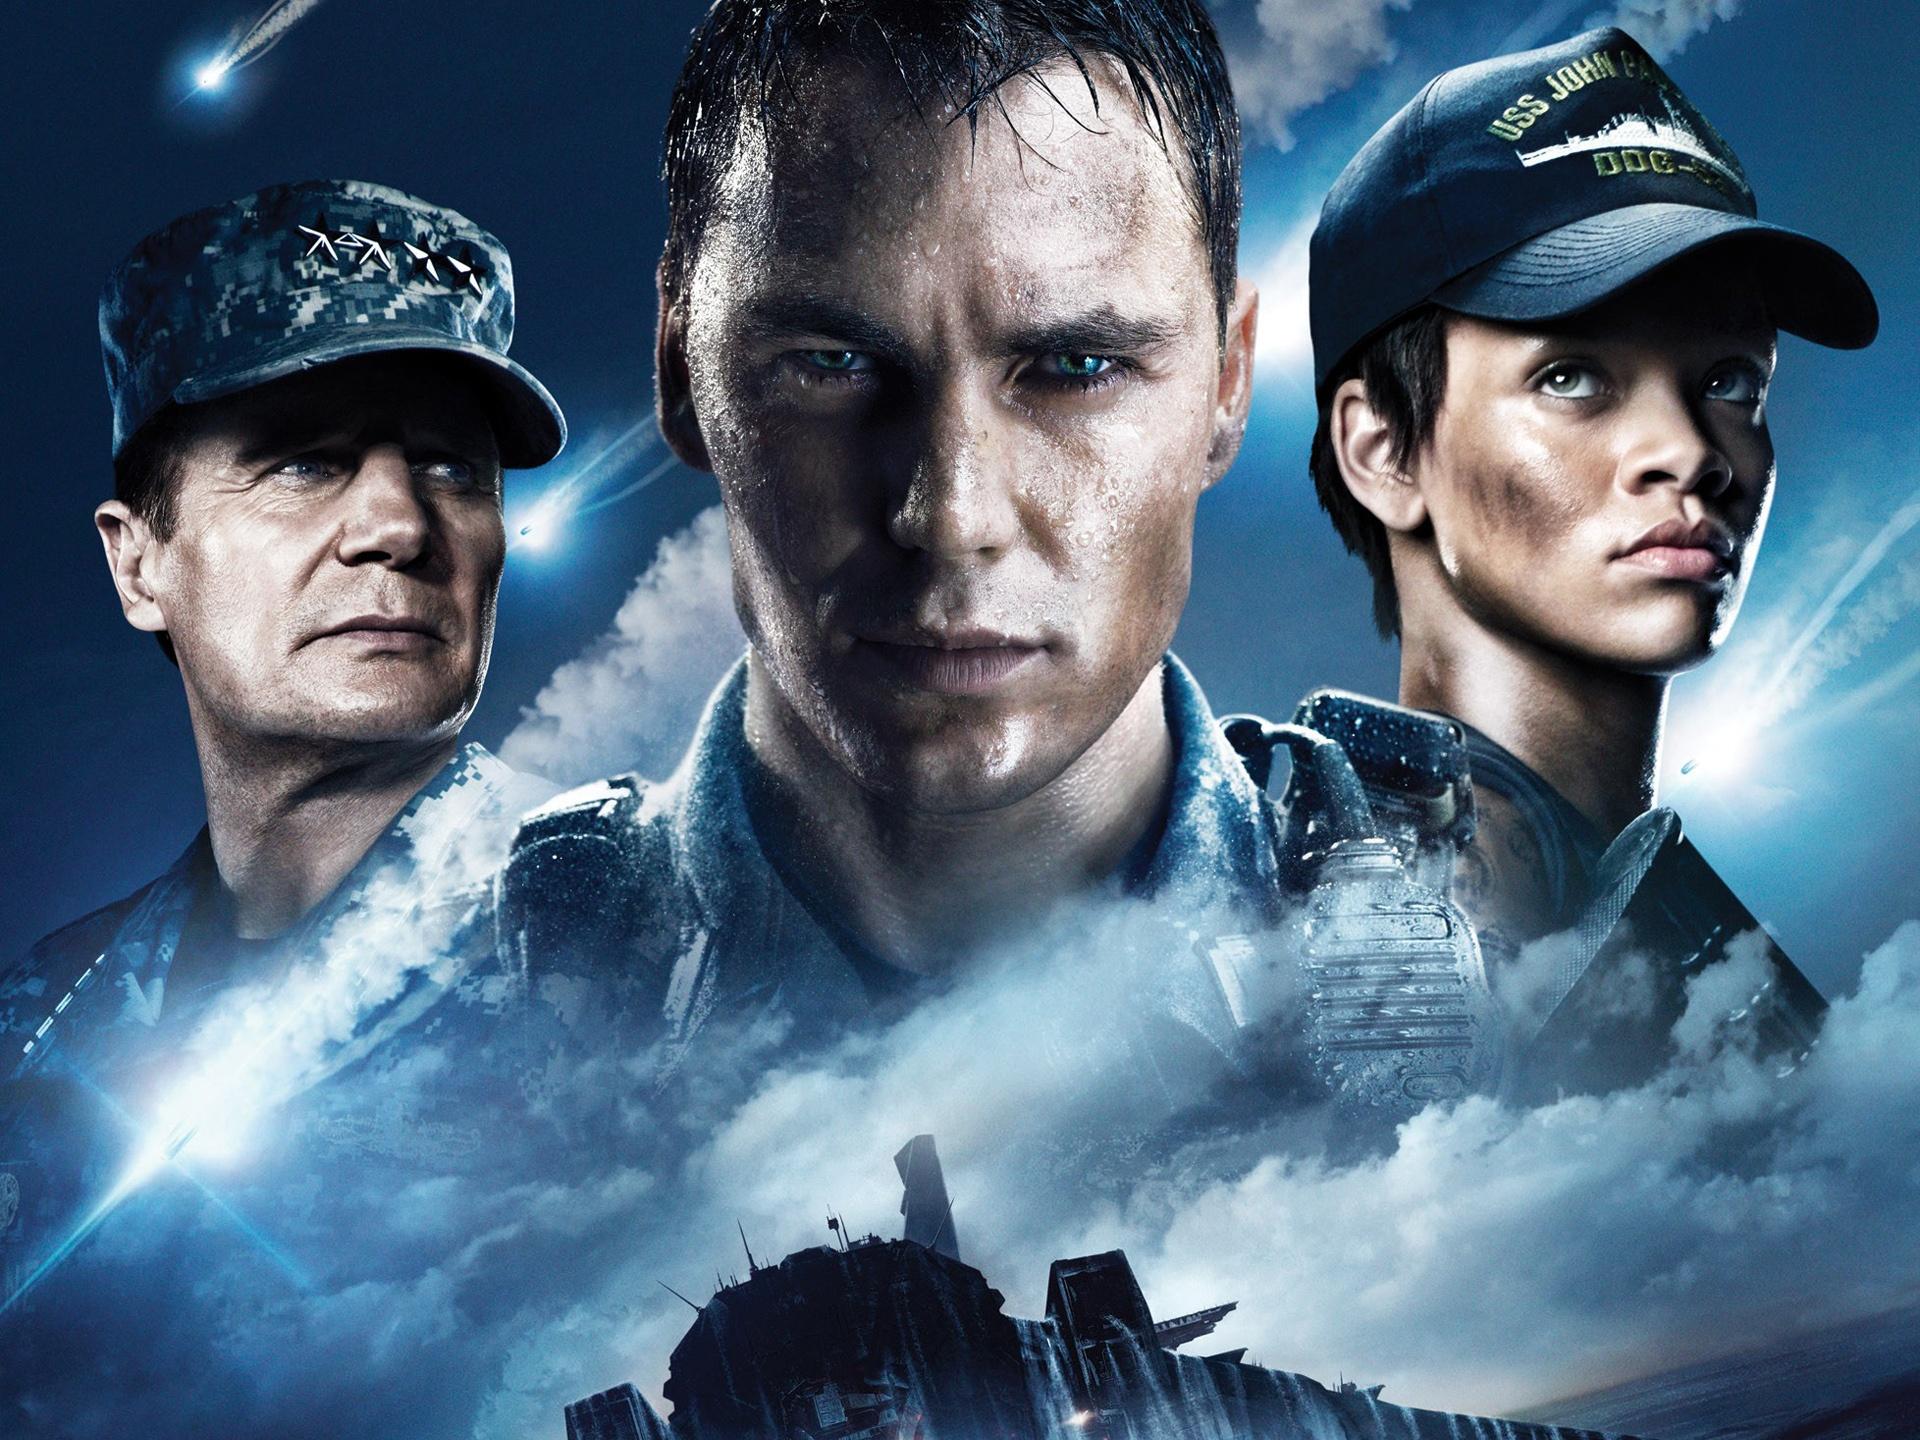 battleship 2012 movie hd - photo #10